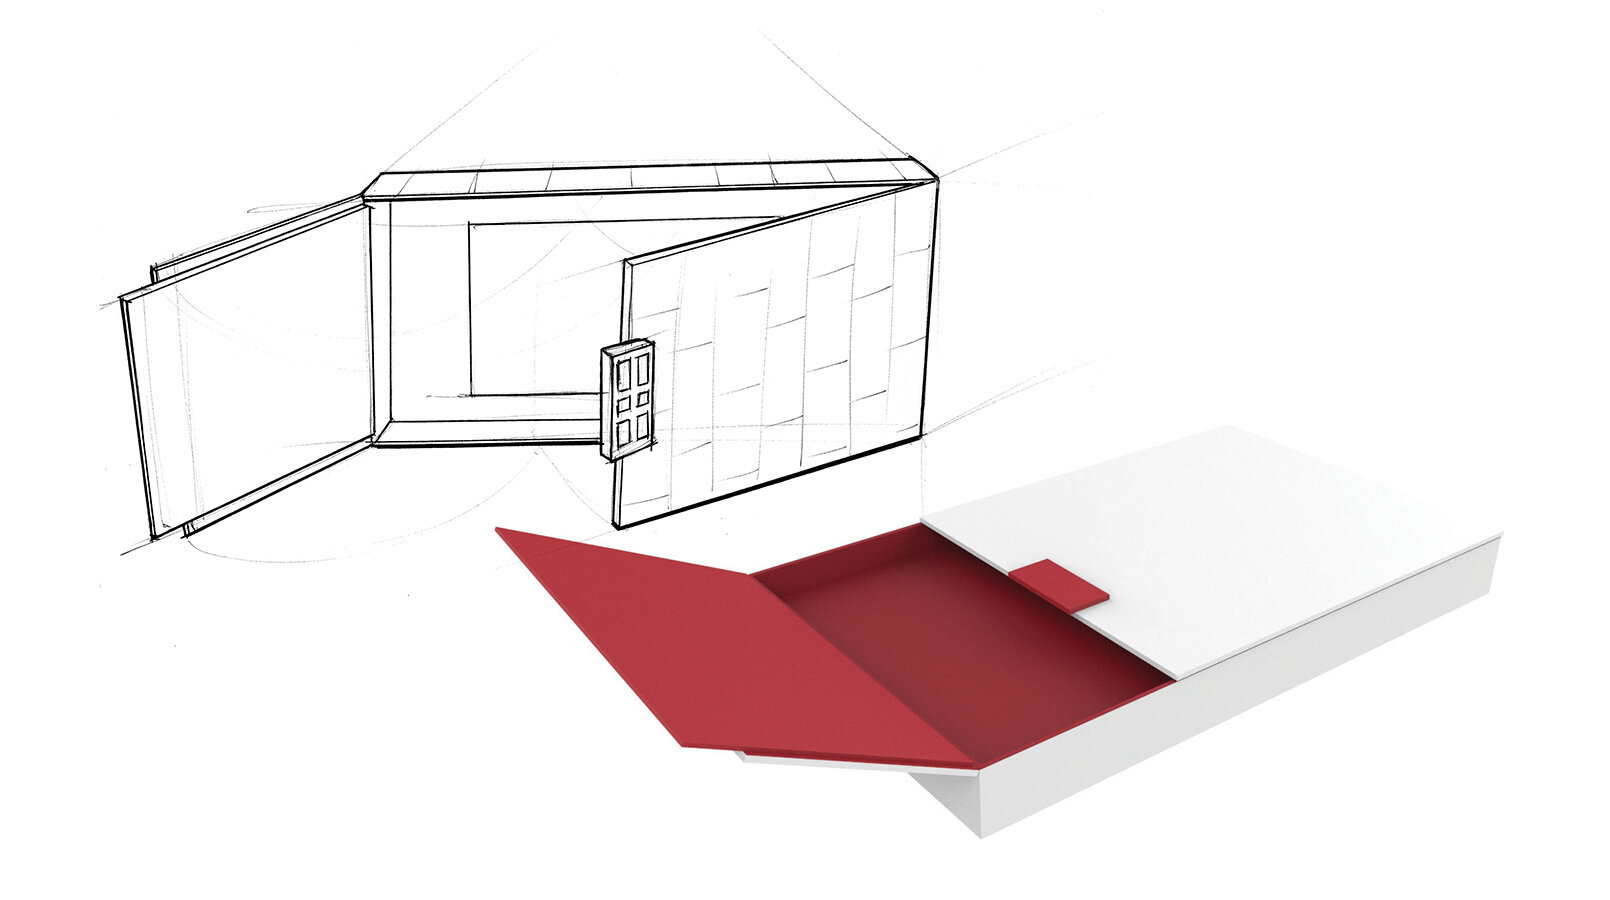 Elizabeth-Arden-Red-Door-Spa-Gift-Card-Packaging-Company-Design-3.jpg